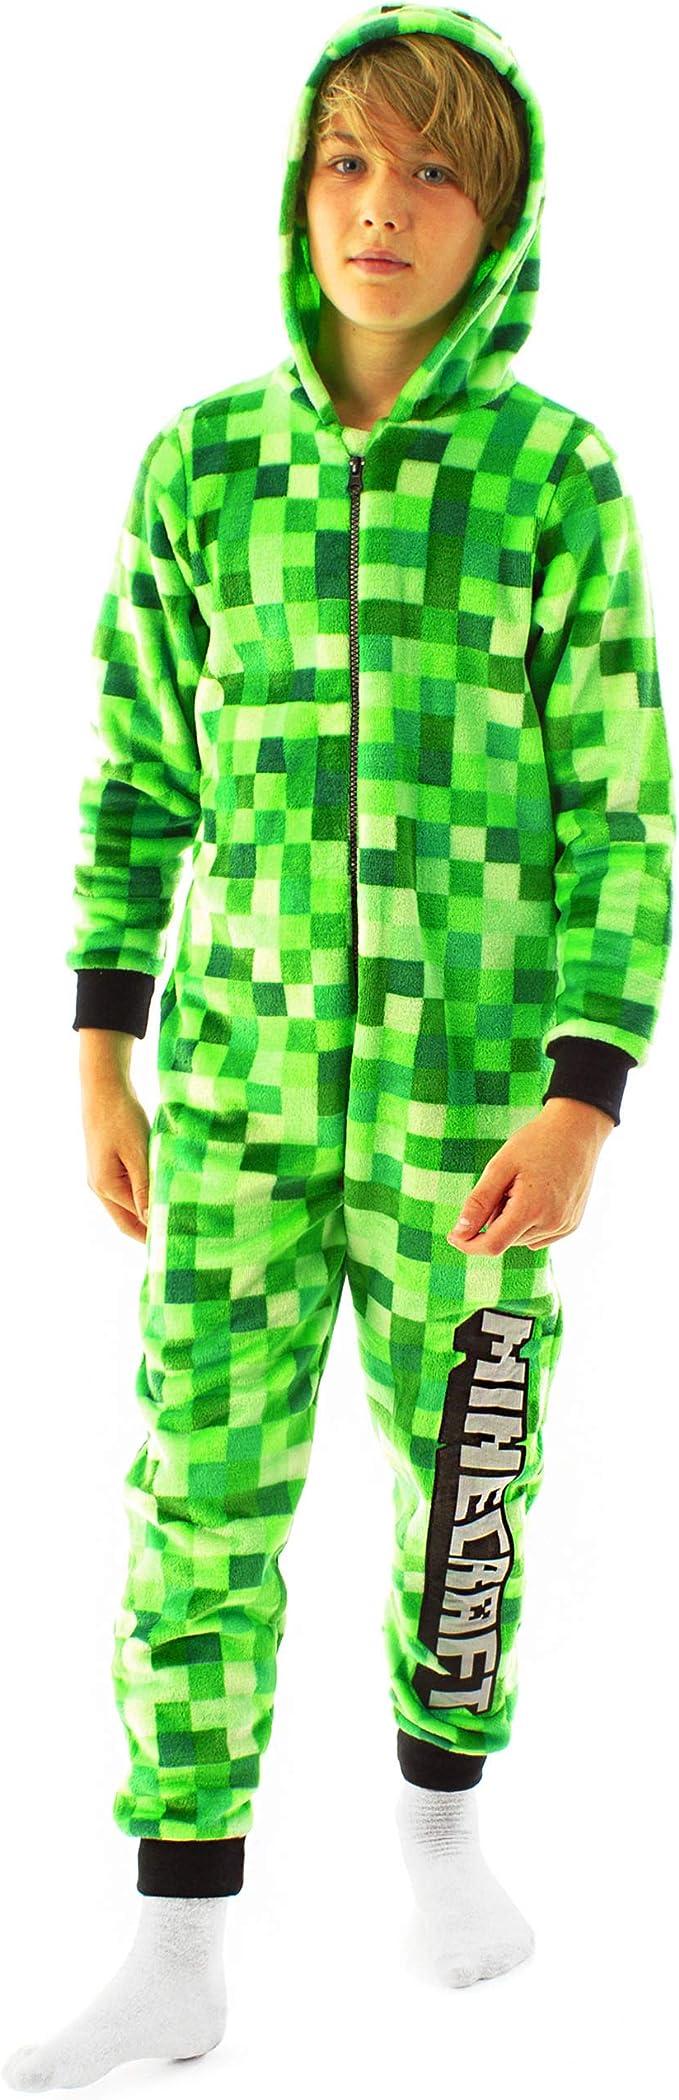 Minecraft Creeper Onesie For Boys & Girls  Kids Green Soft